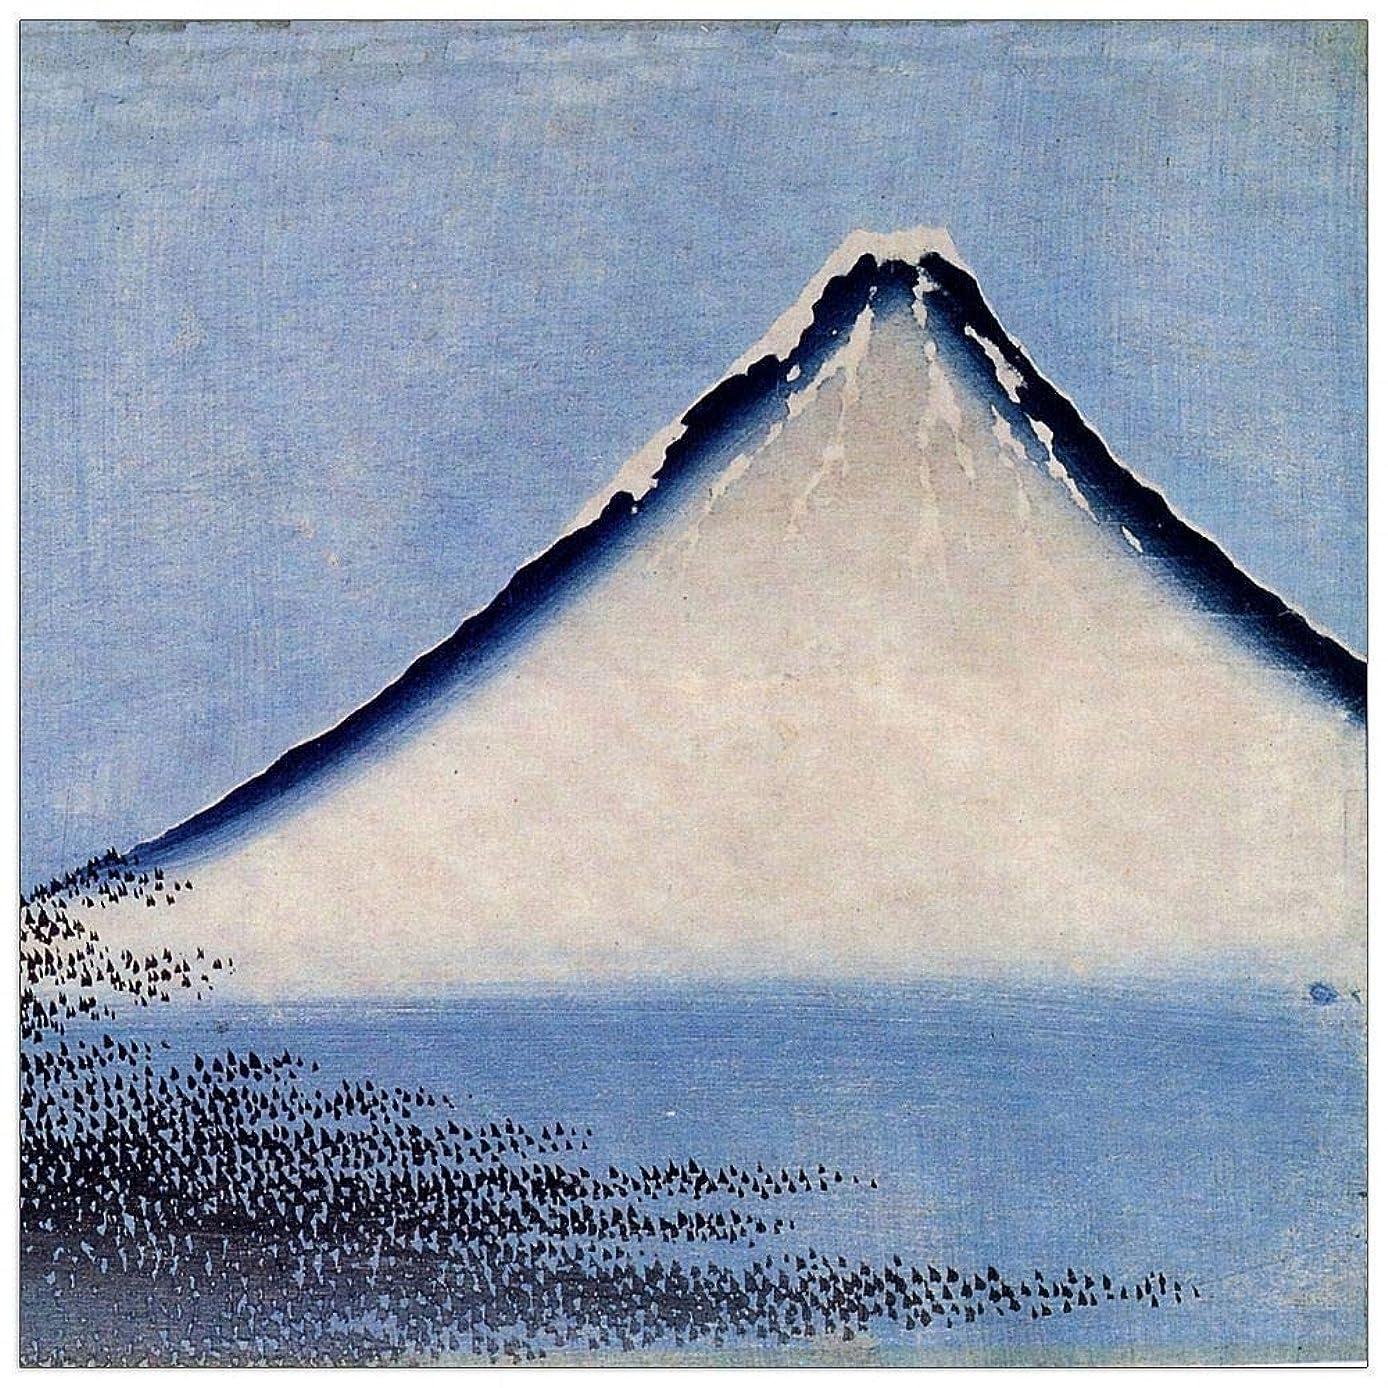 ArtPlaza TW90071 Hokusai Katsushika-Mount Fuji [2] Decorative Panel, 23.5x23.5 Inch, Multicolored